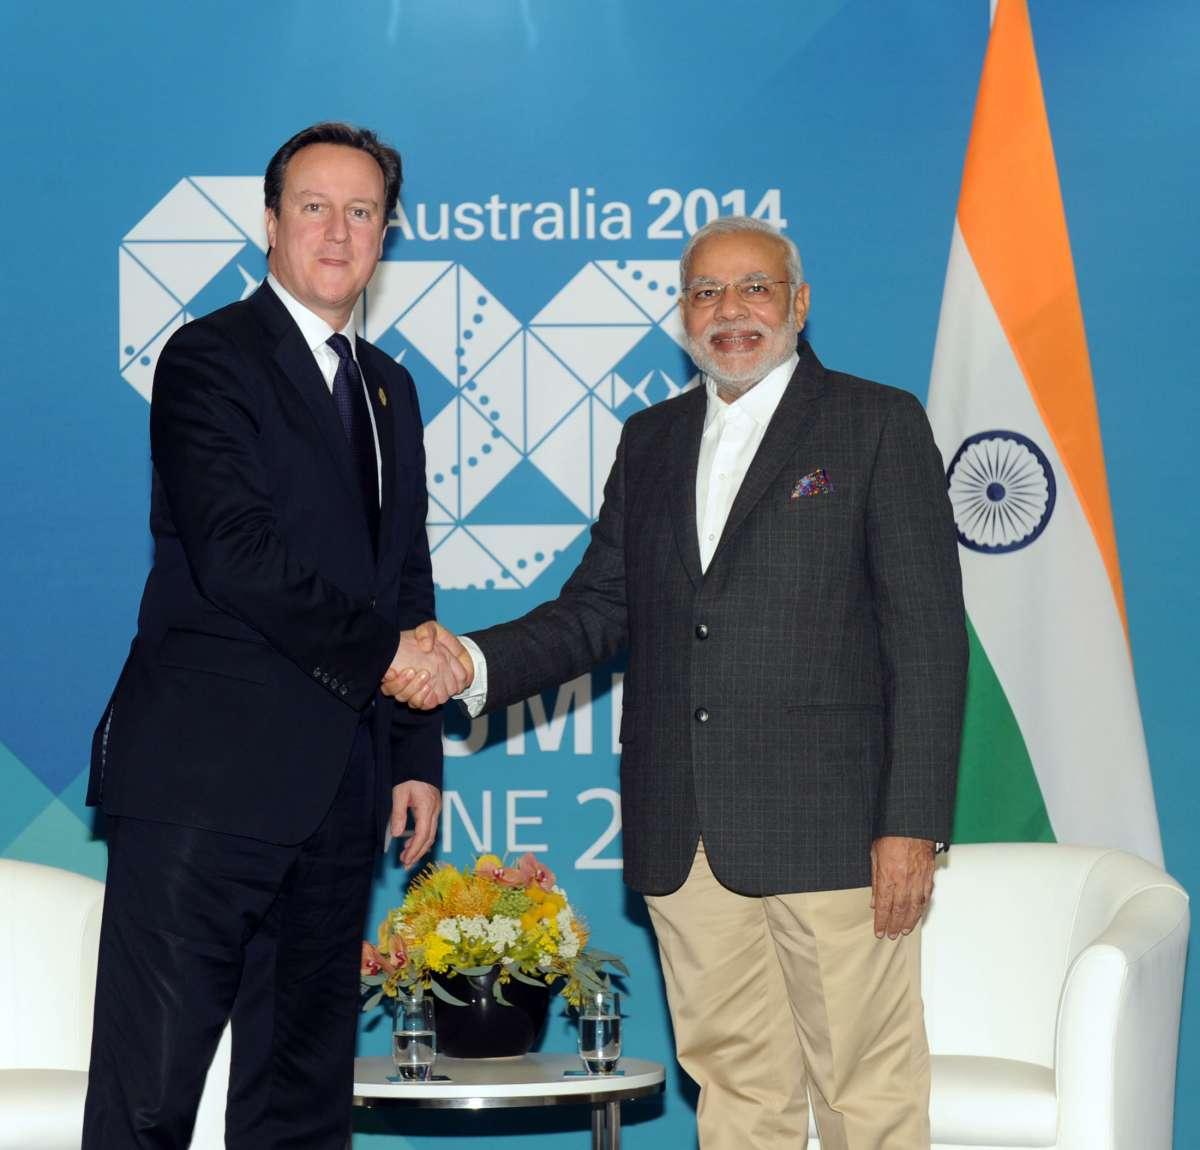 The Prime Minister, Shri Narendra Modi meeting the Prime Minister of United Kingdom, Mr. David Cameron, in Brisbane, Australia on November 14, 2014.